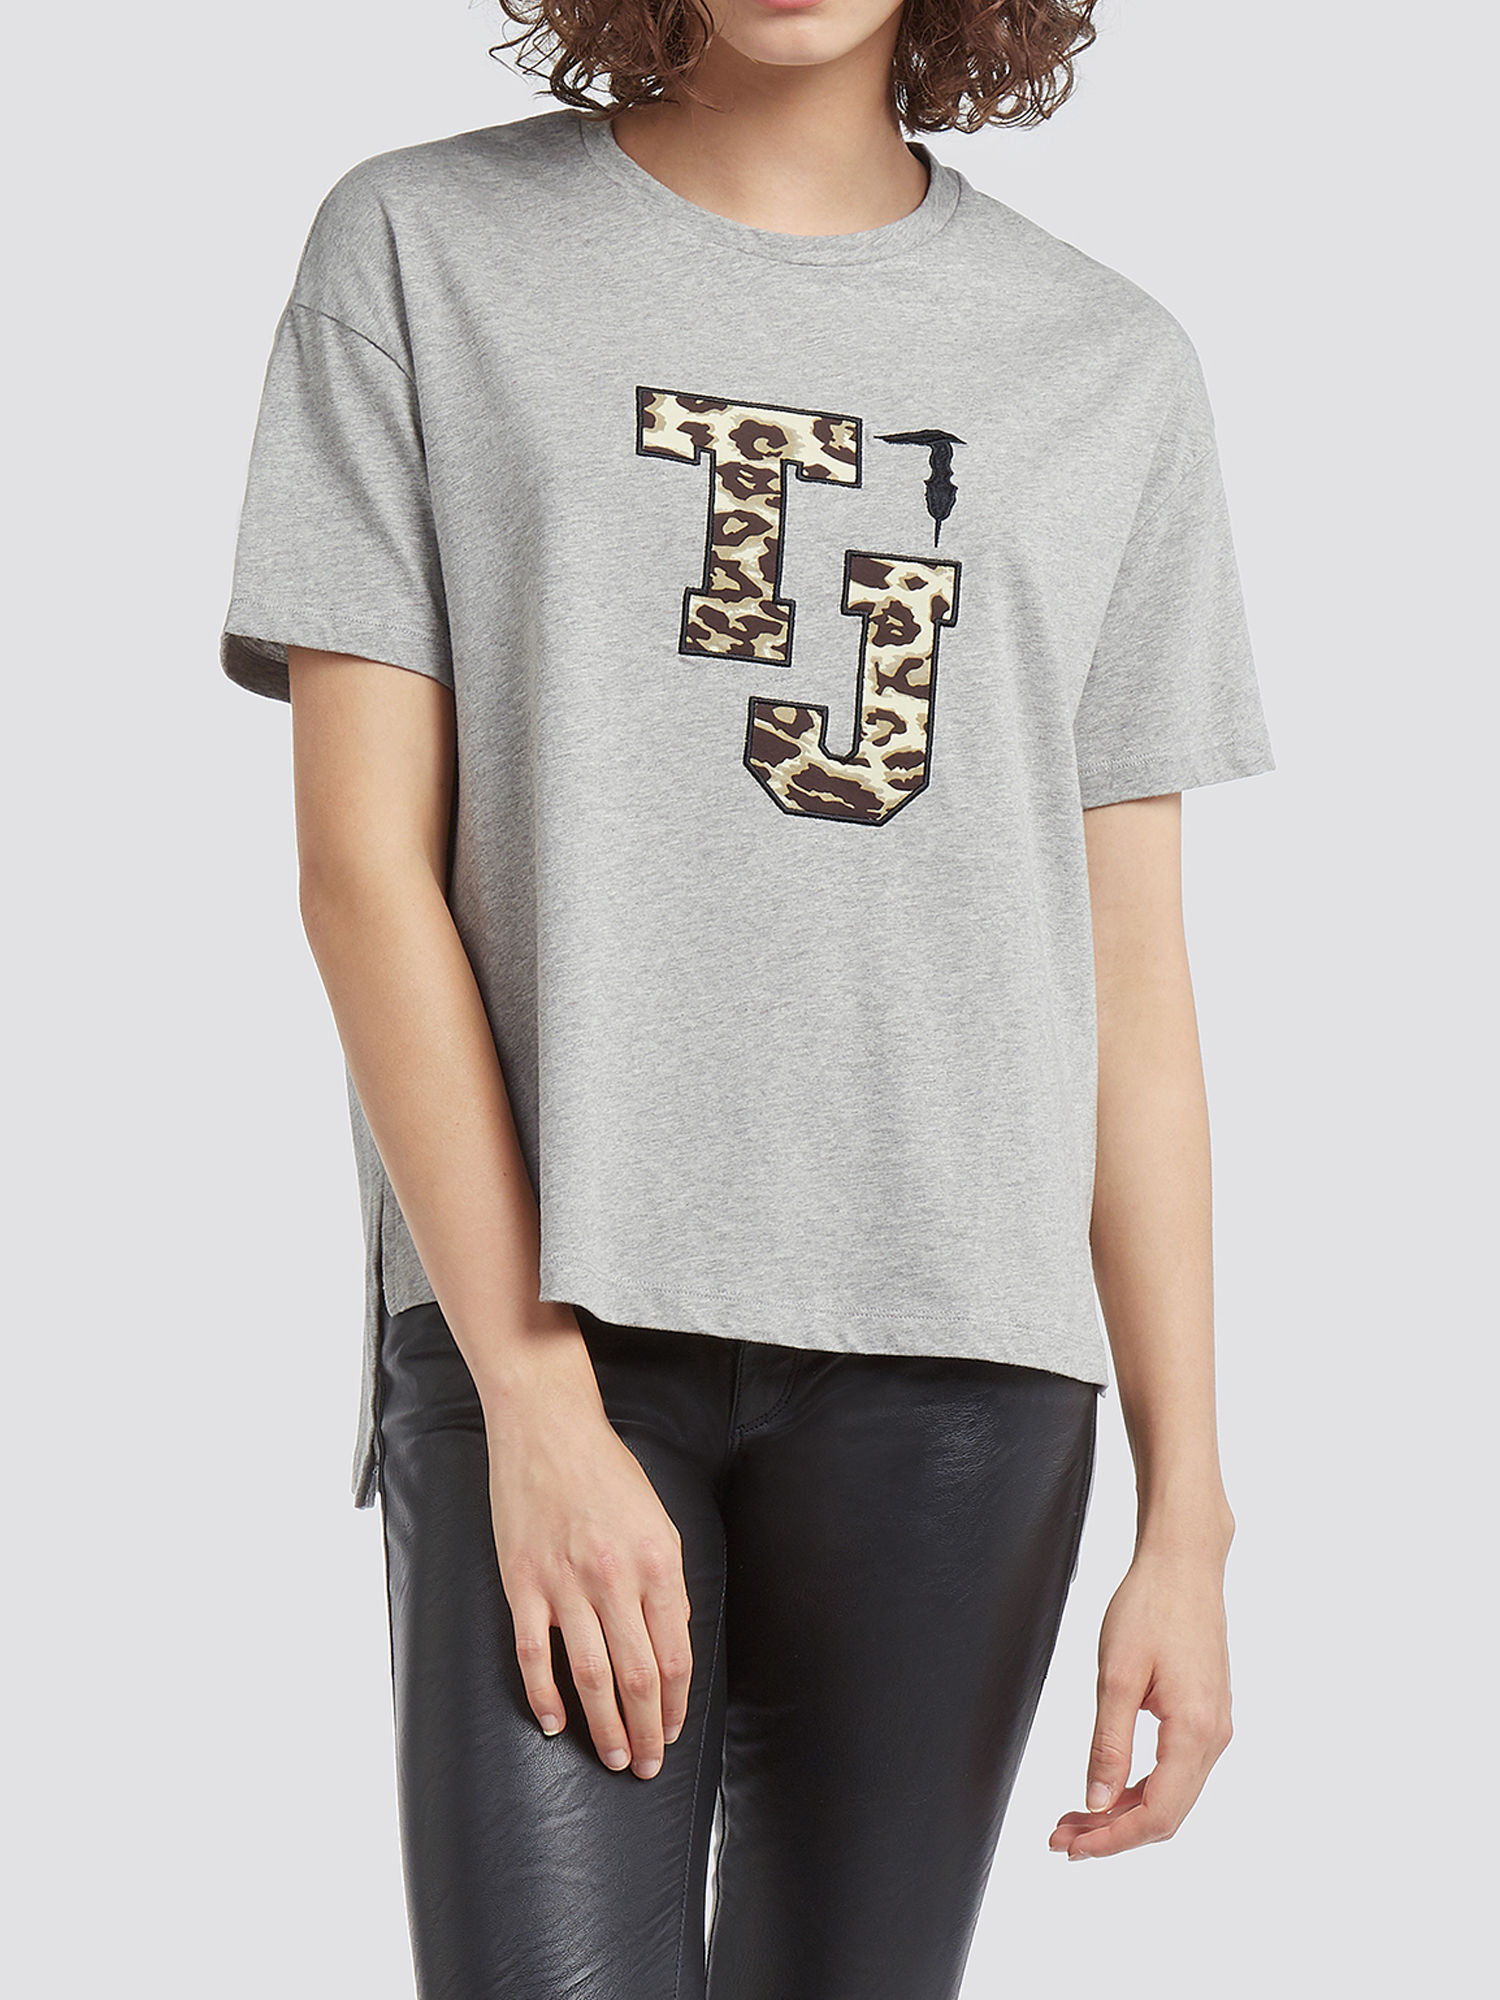 d7ff7c89174b9 Melange-T-shirt-with-logo-patch-and-asymmetrical-hem_TRUSSARDI-JEANS_50_01_8057735604456_F.jpg